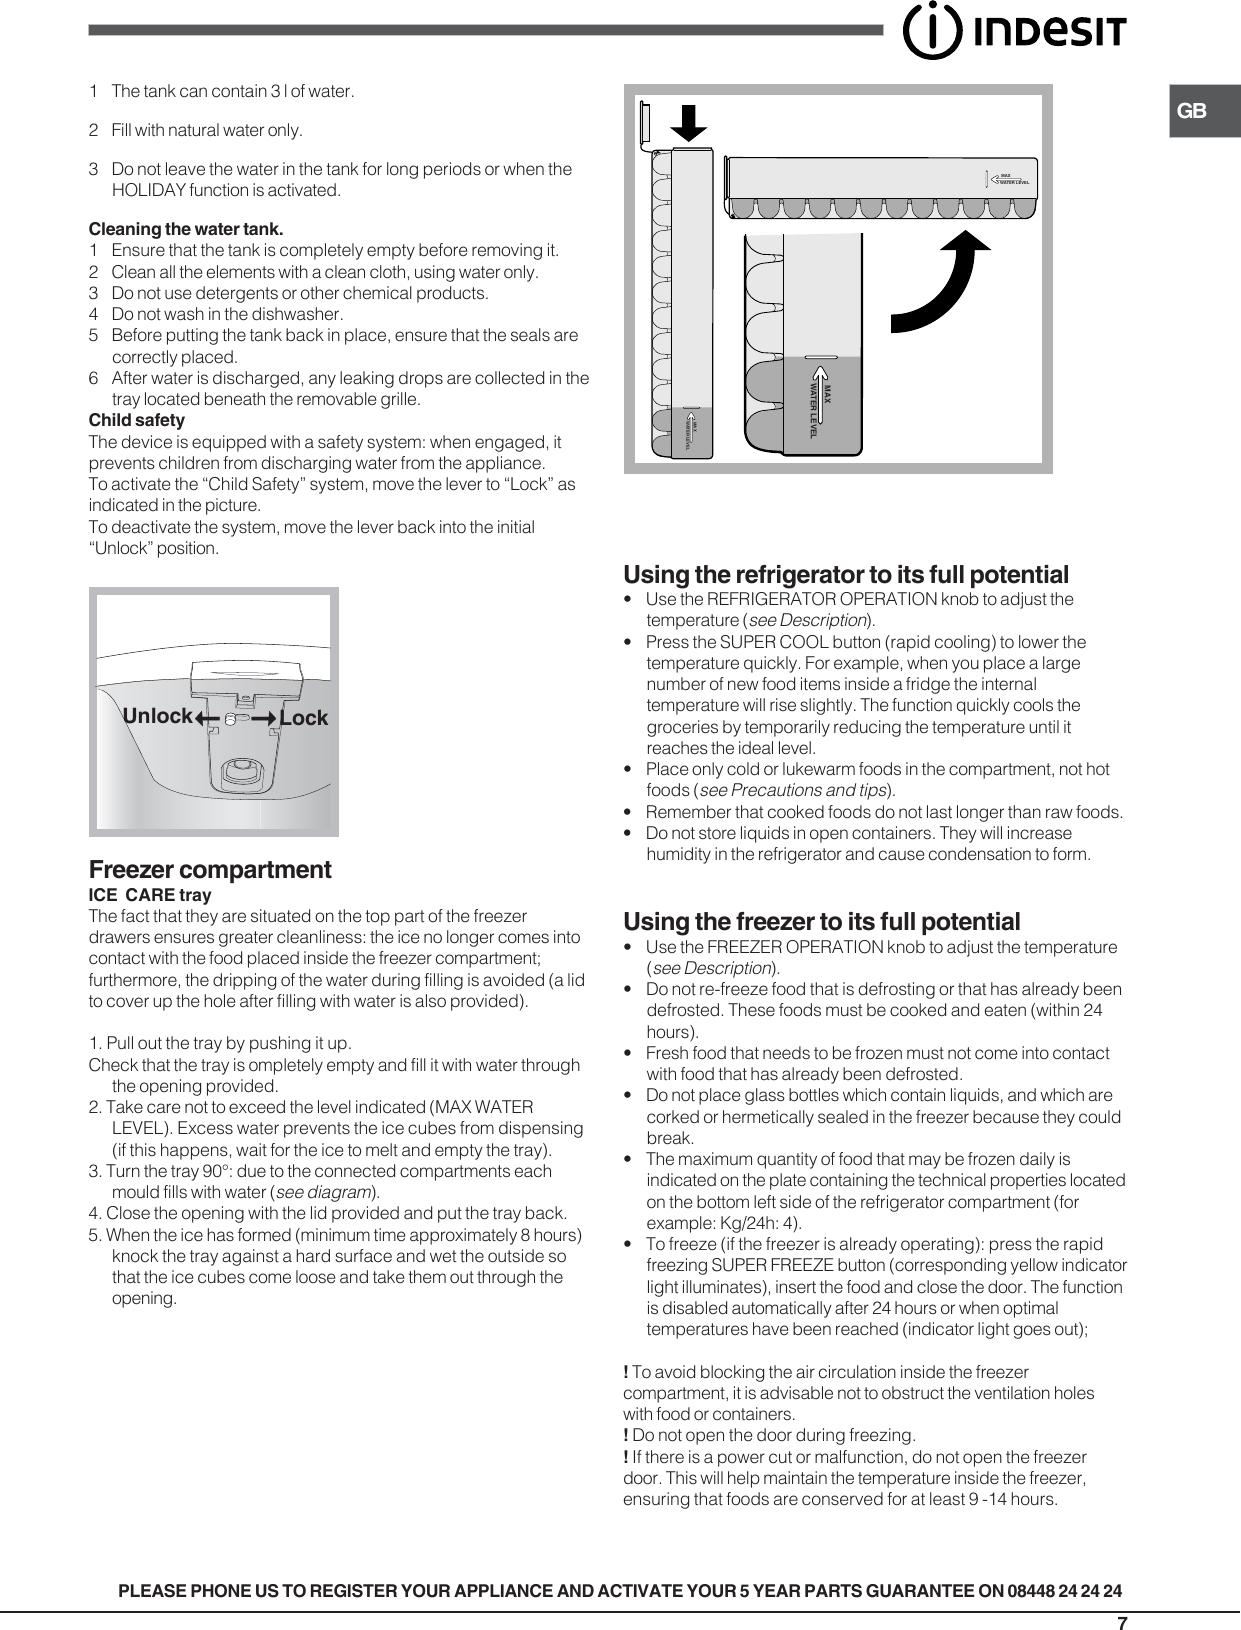 Indesit refrigerator ban 40 users manual 19508693000gb tr page 7 of 12 indesit indesit refrigerator ban 40 users cheapraybanclubmaster Images